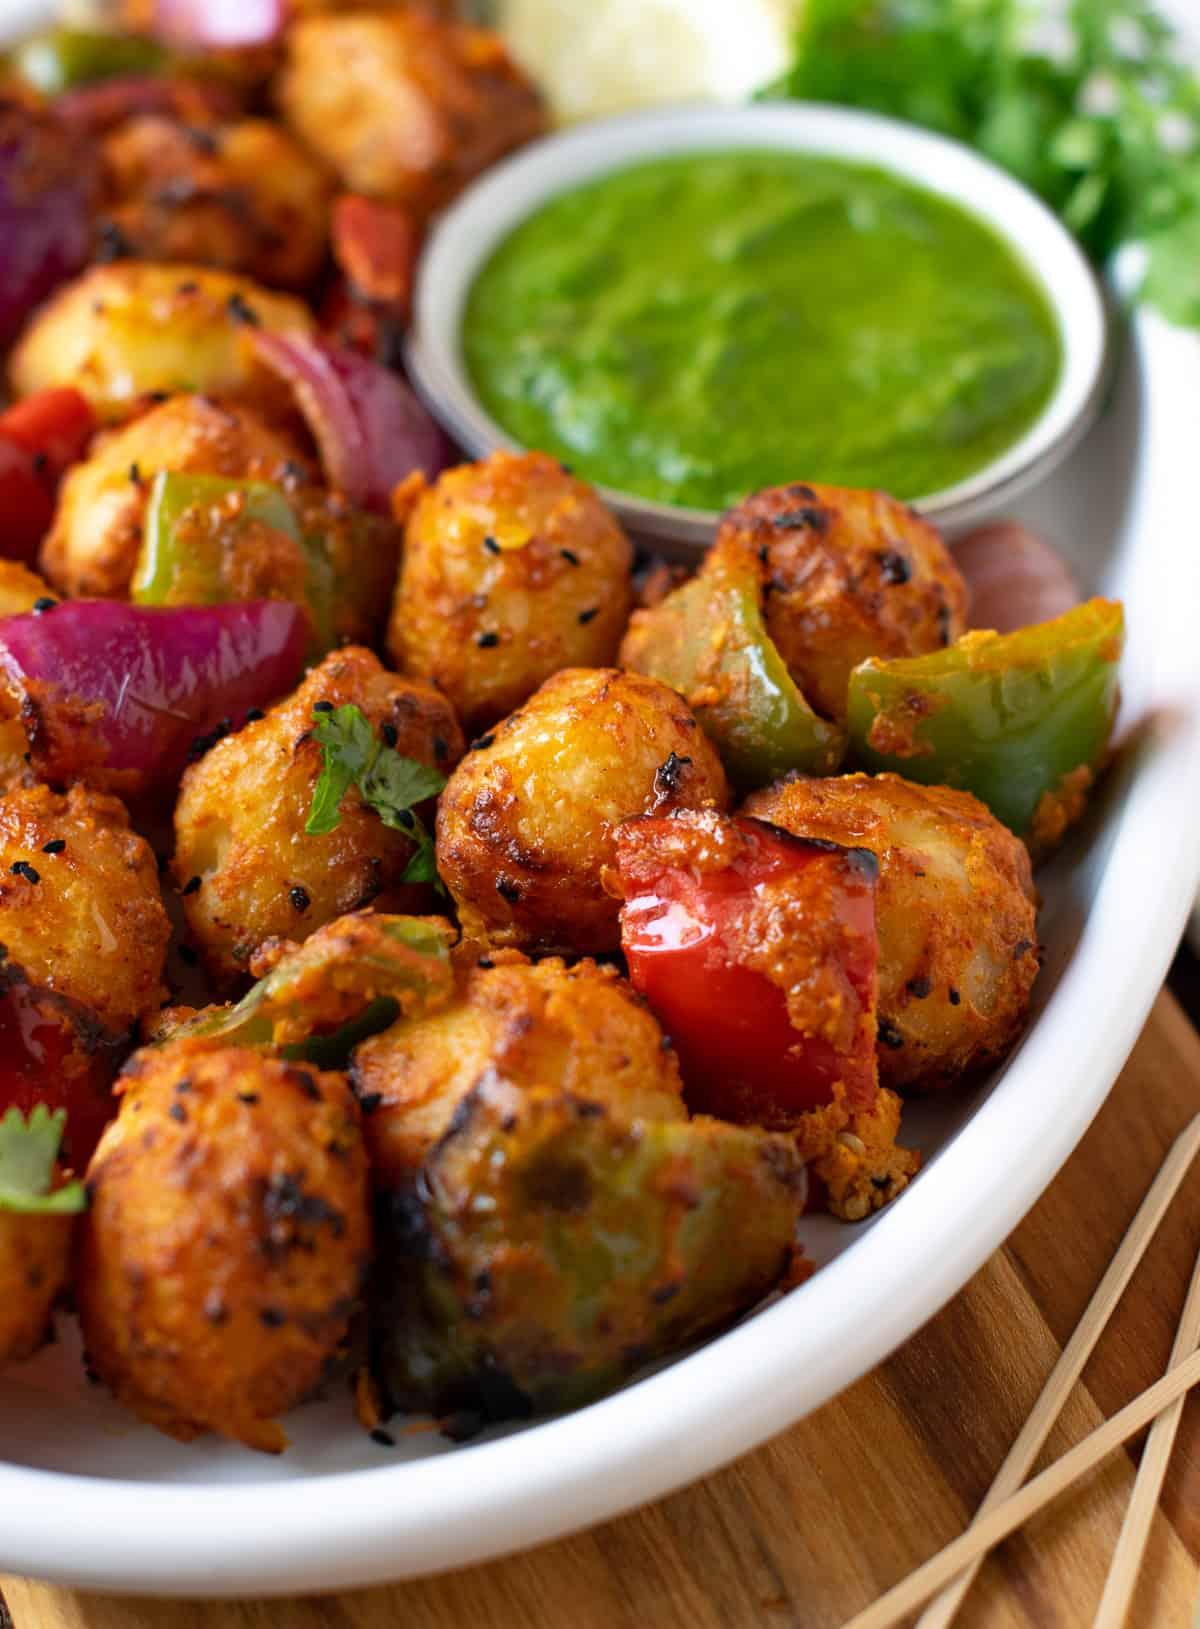 Tandoori potatoes served in a white plate